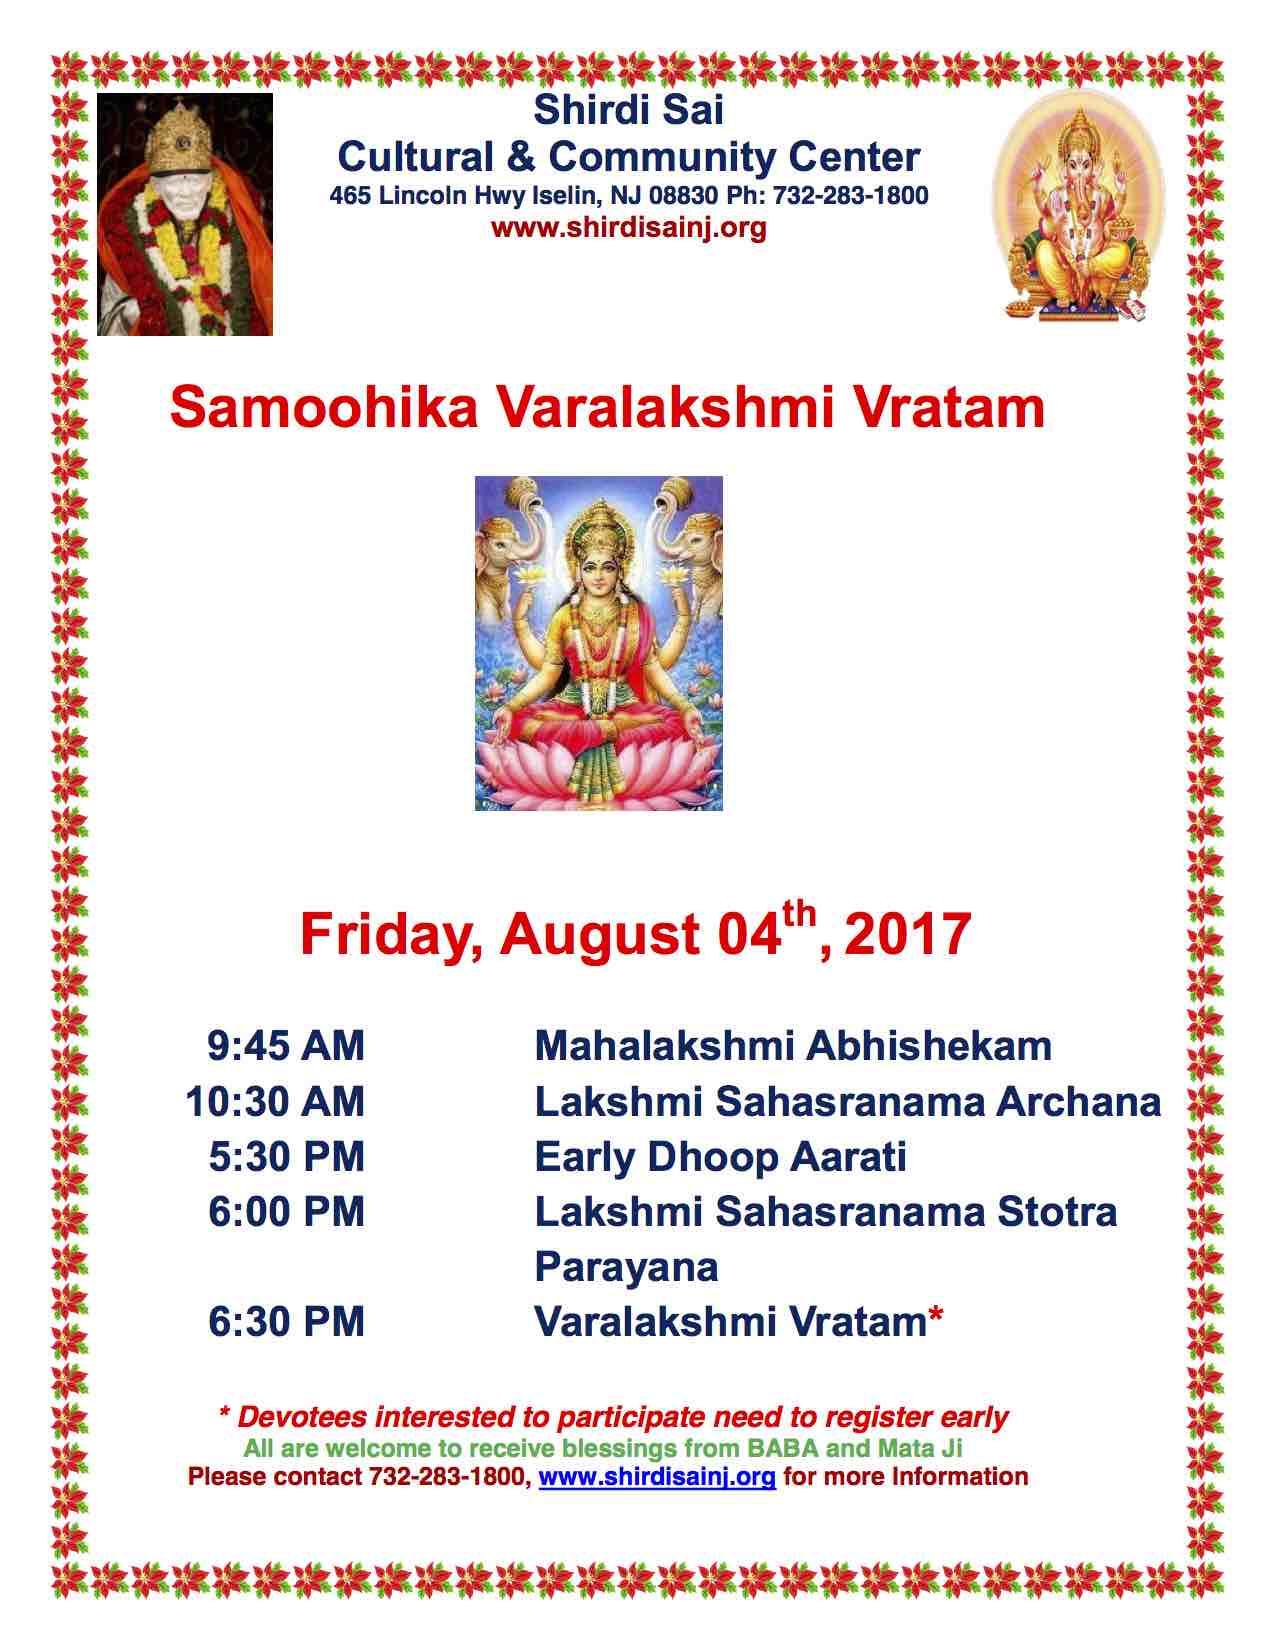 VaraLakshmi 2017 Sai Mandir